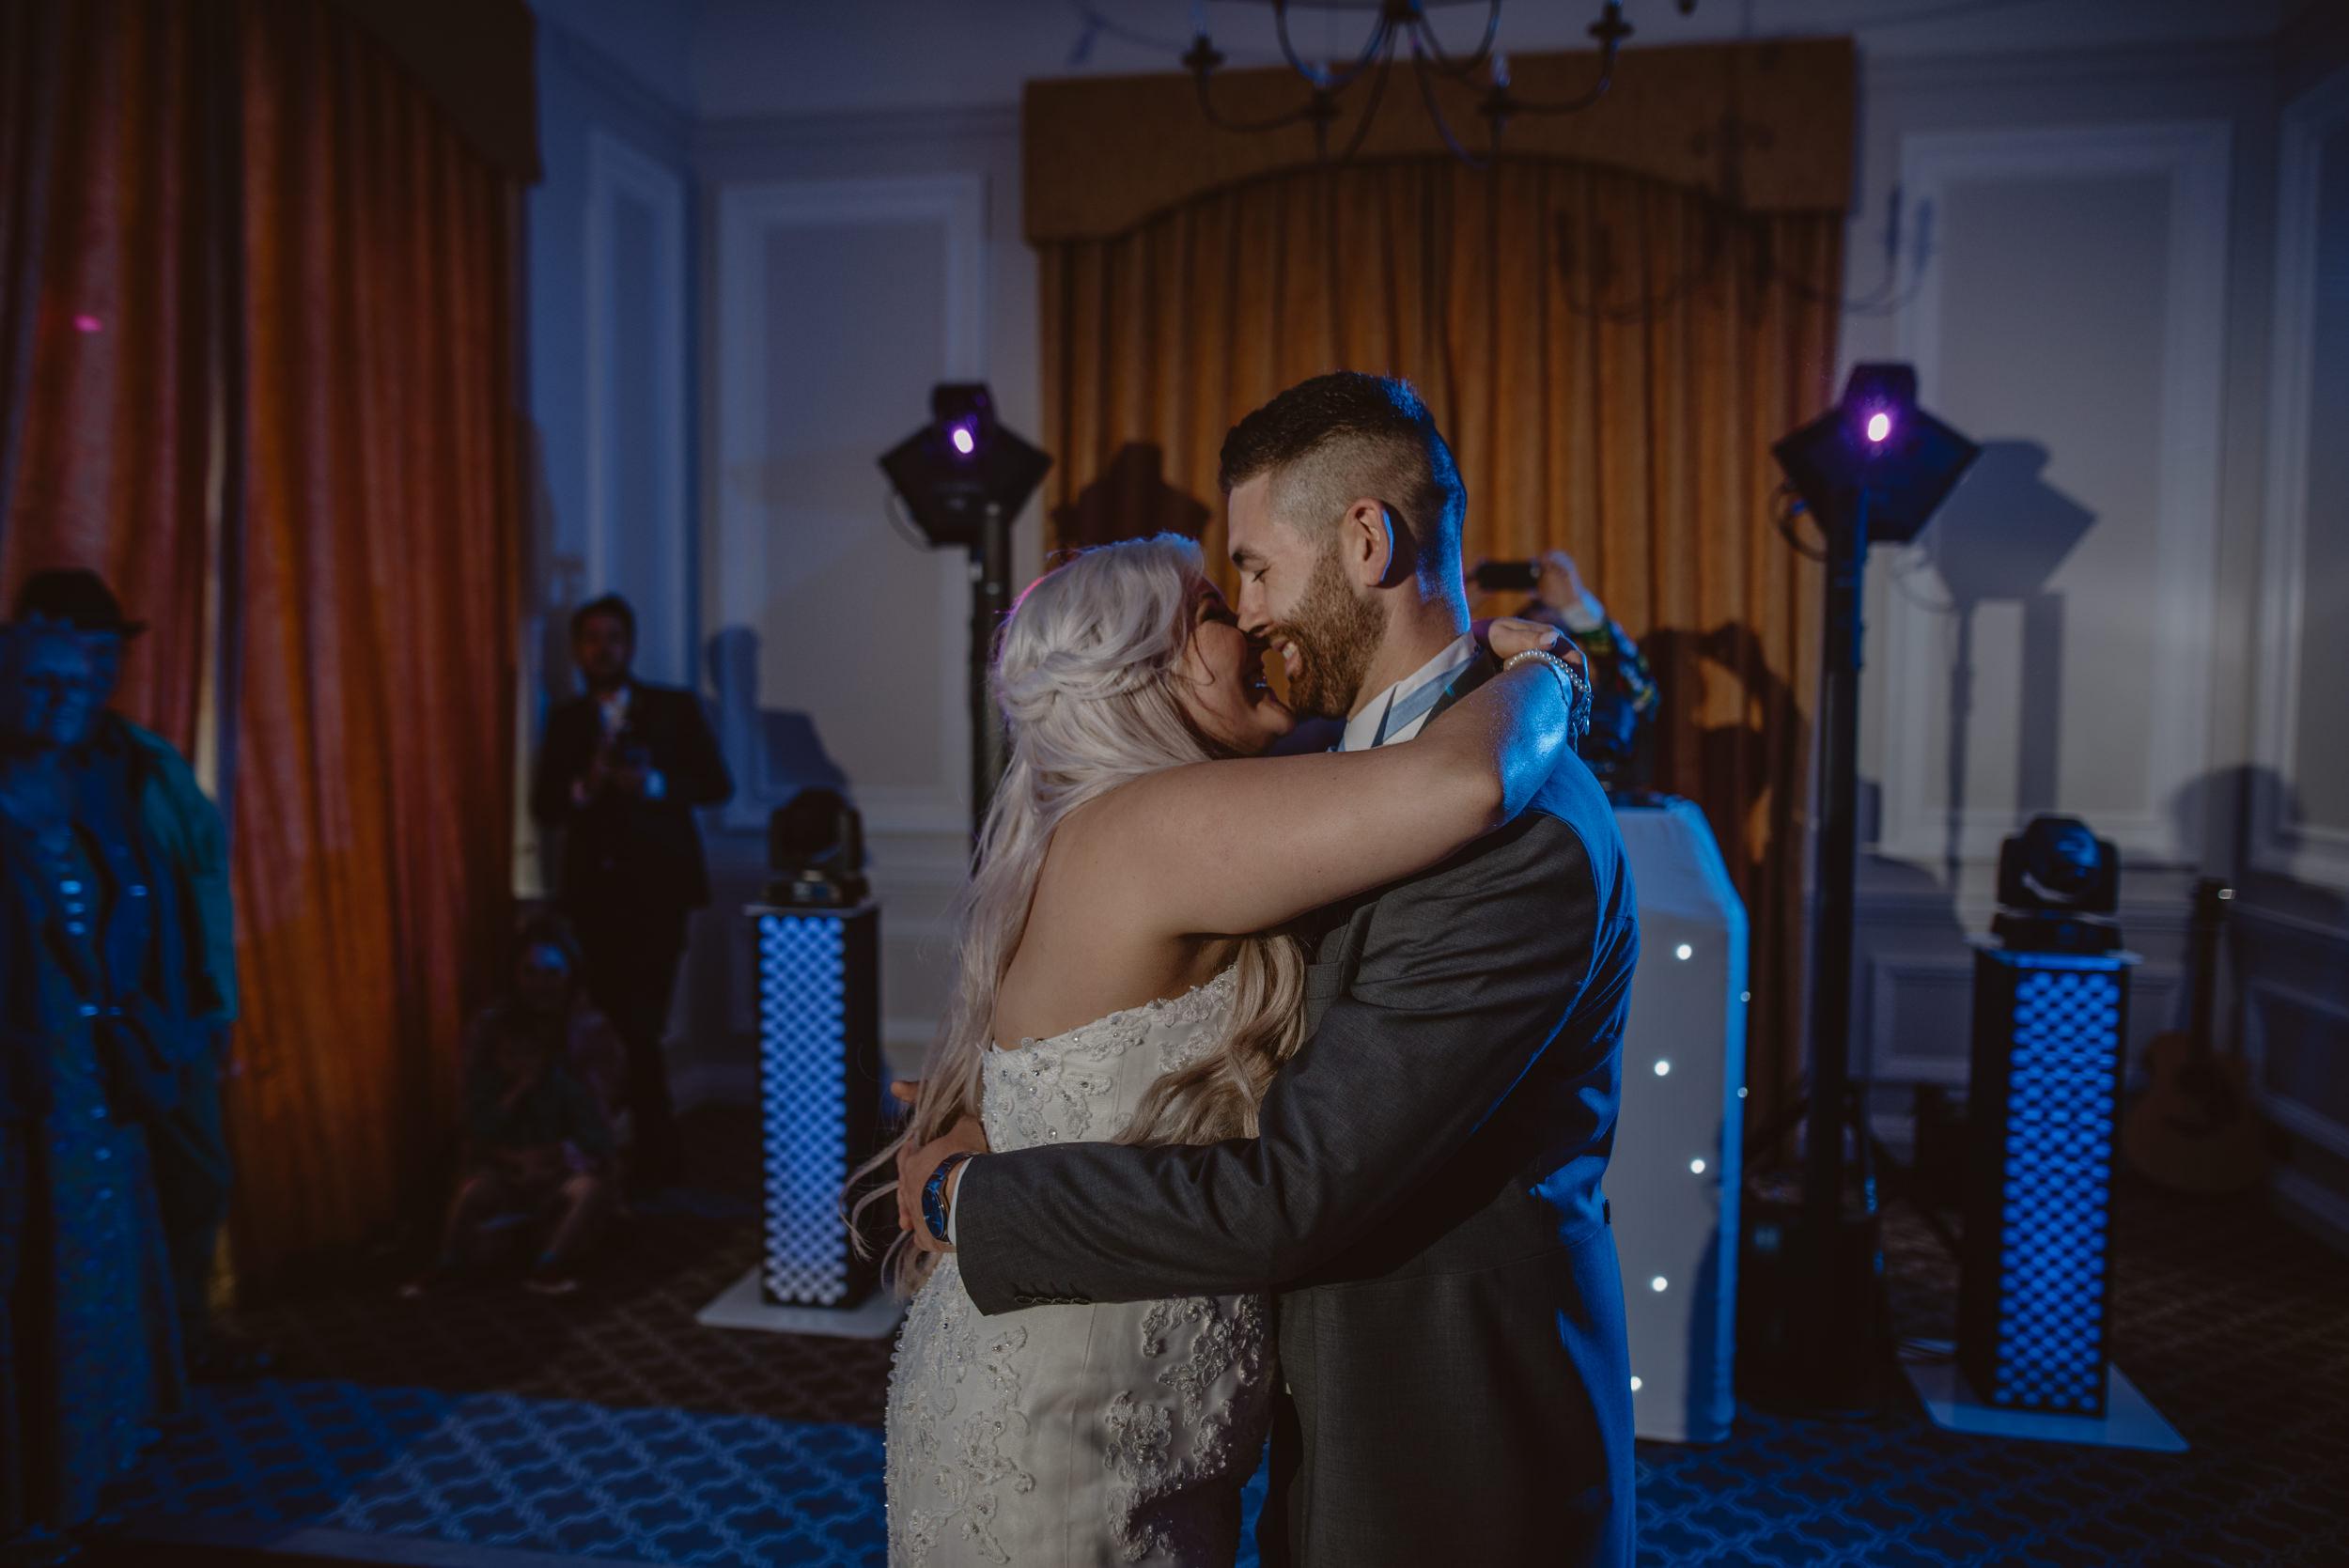 Rachel-and-James-Wedding-Horsley-Towers-State-Manu-Mendoza-Wedding-Photography-518.jpg